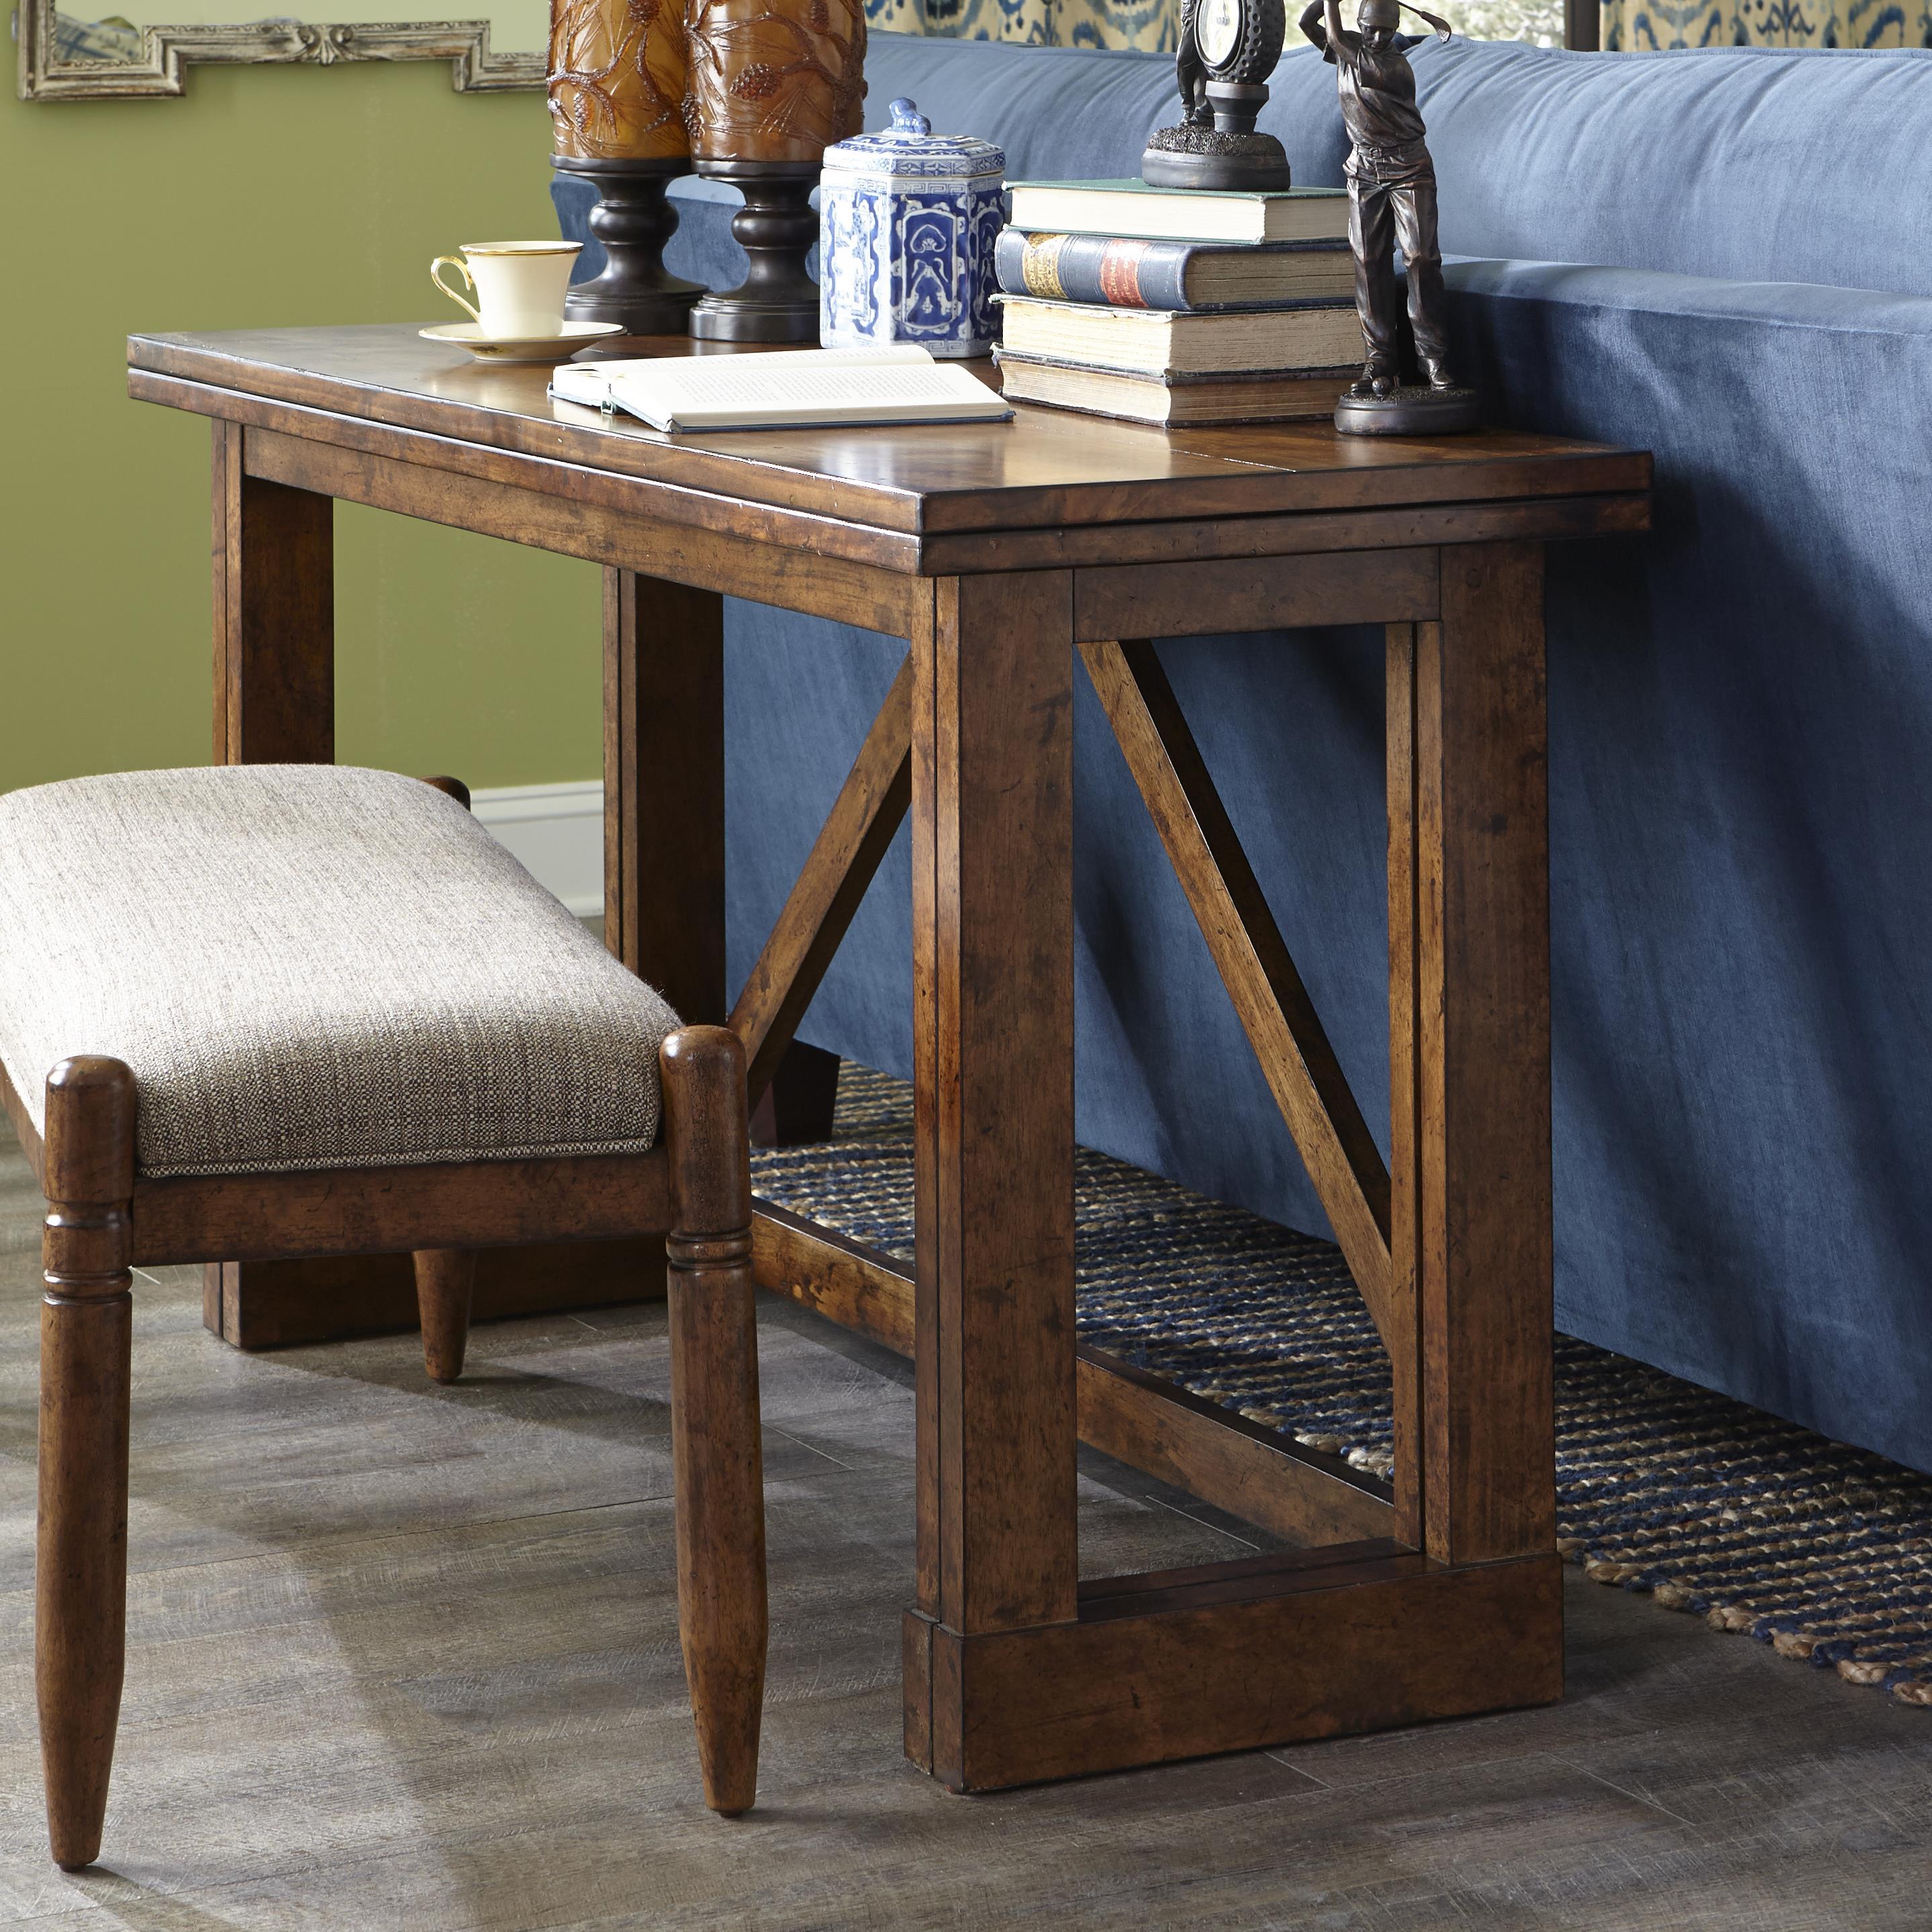 Easton Collection Farmhouse Gate Leg Sofa Table - Item Number: 436-825 STBL